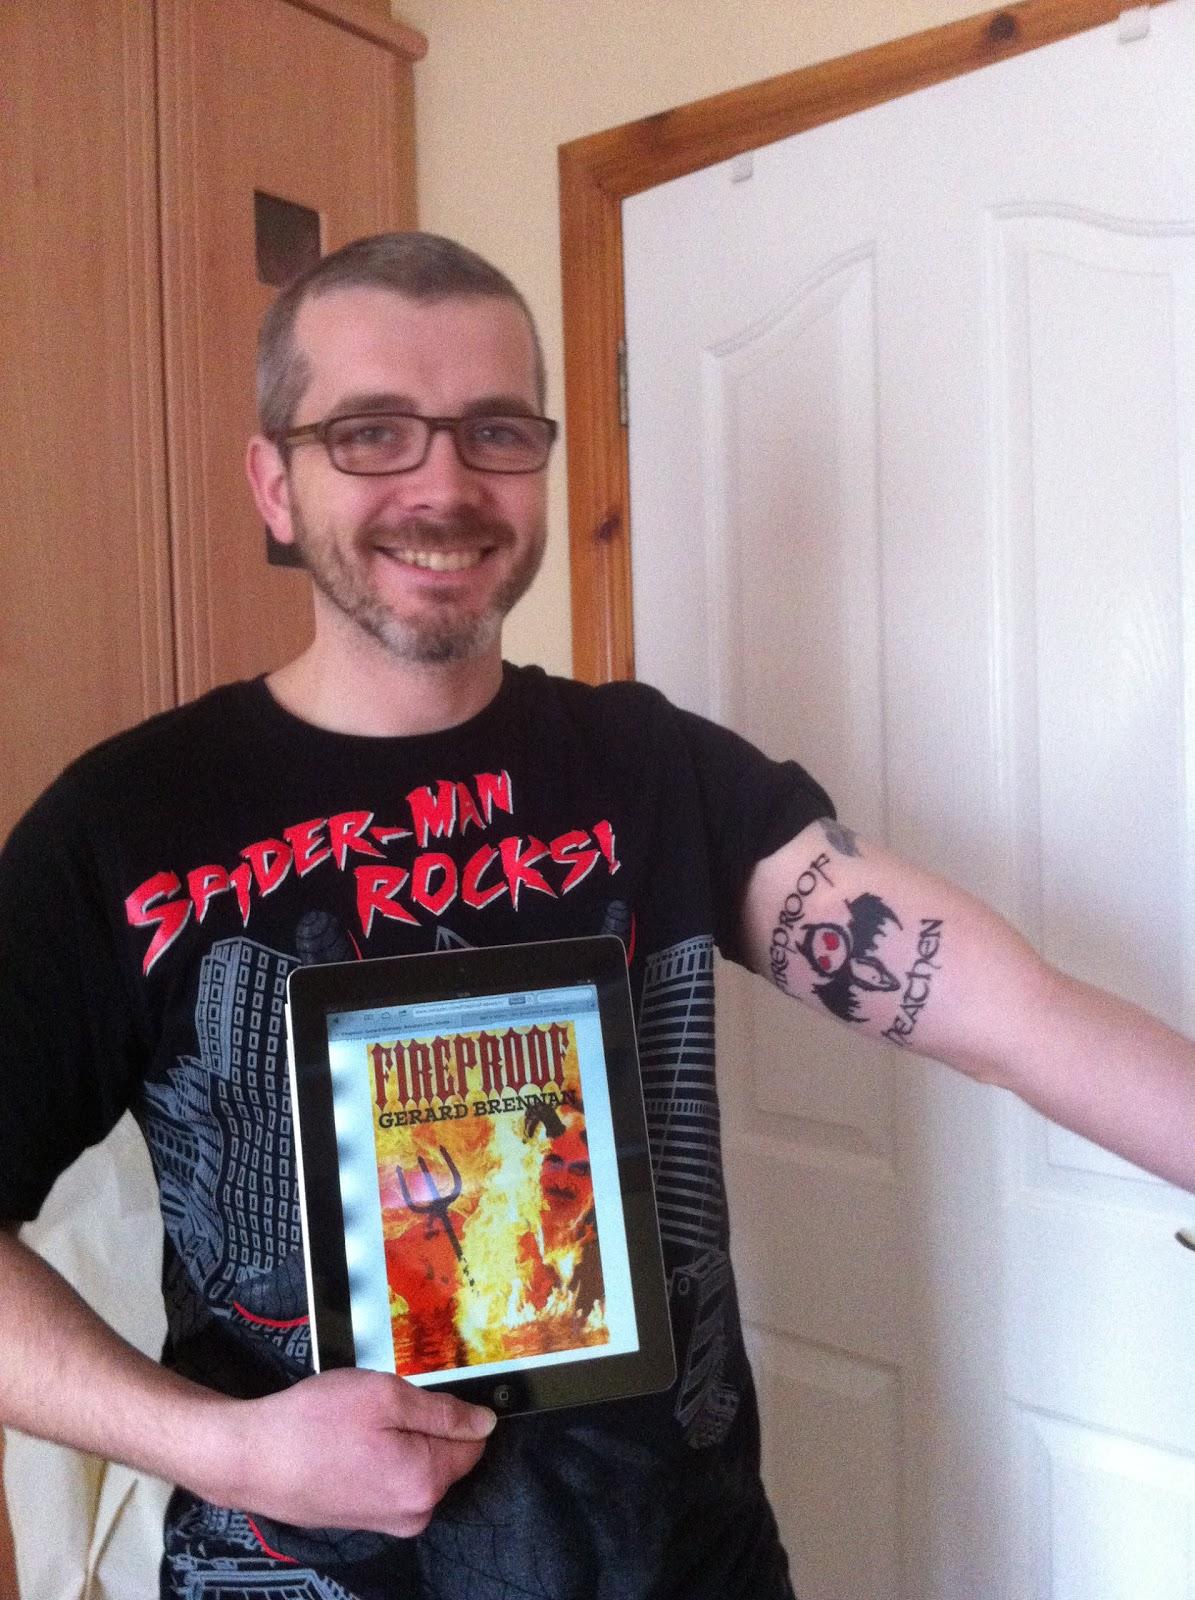 related epic fail piercings epic fail ugliest tattoos epic fail    Epic Fail Piercings